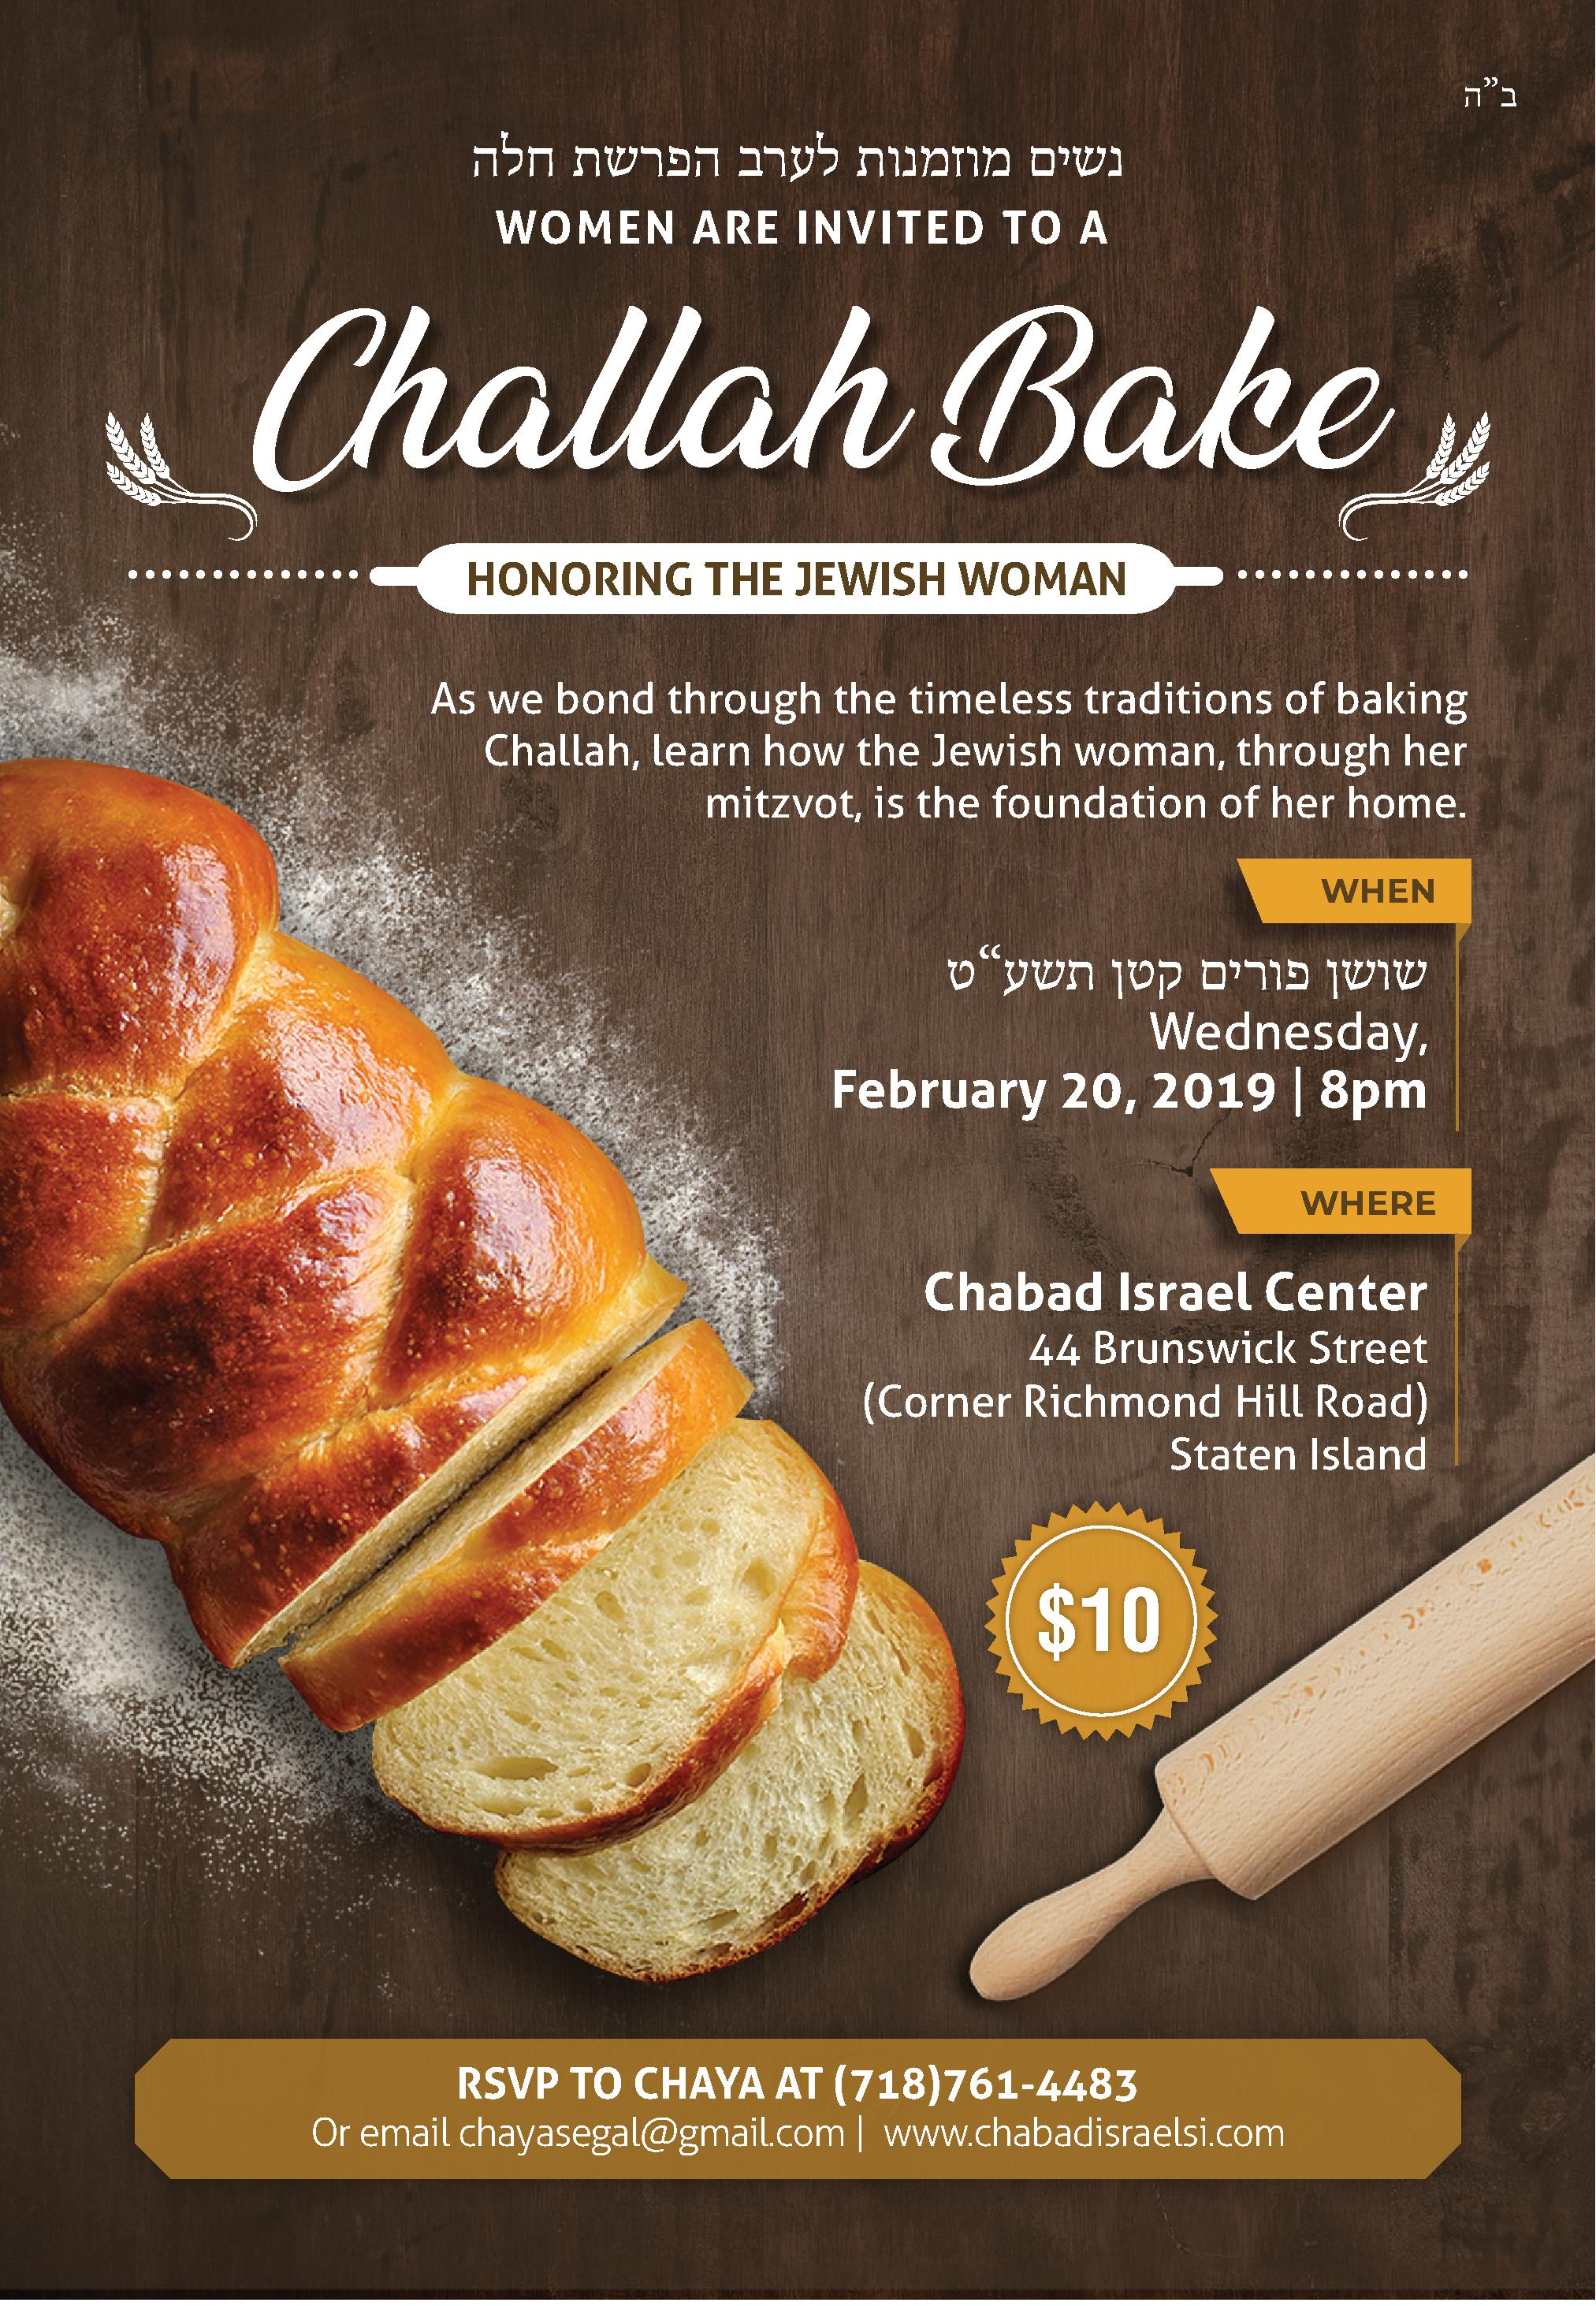 Chabad Israel SI Challah Bake Poster-01 PRINT.jpg